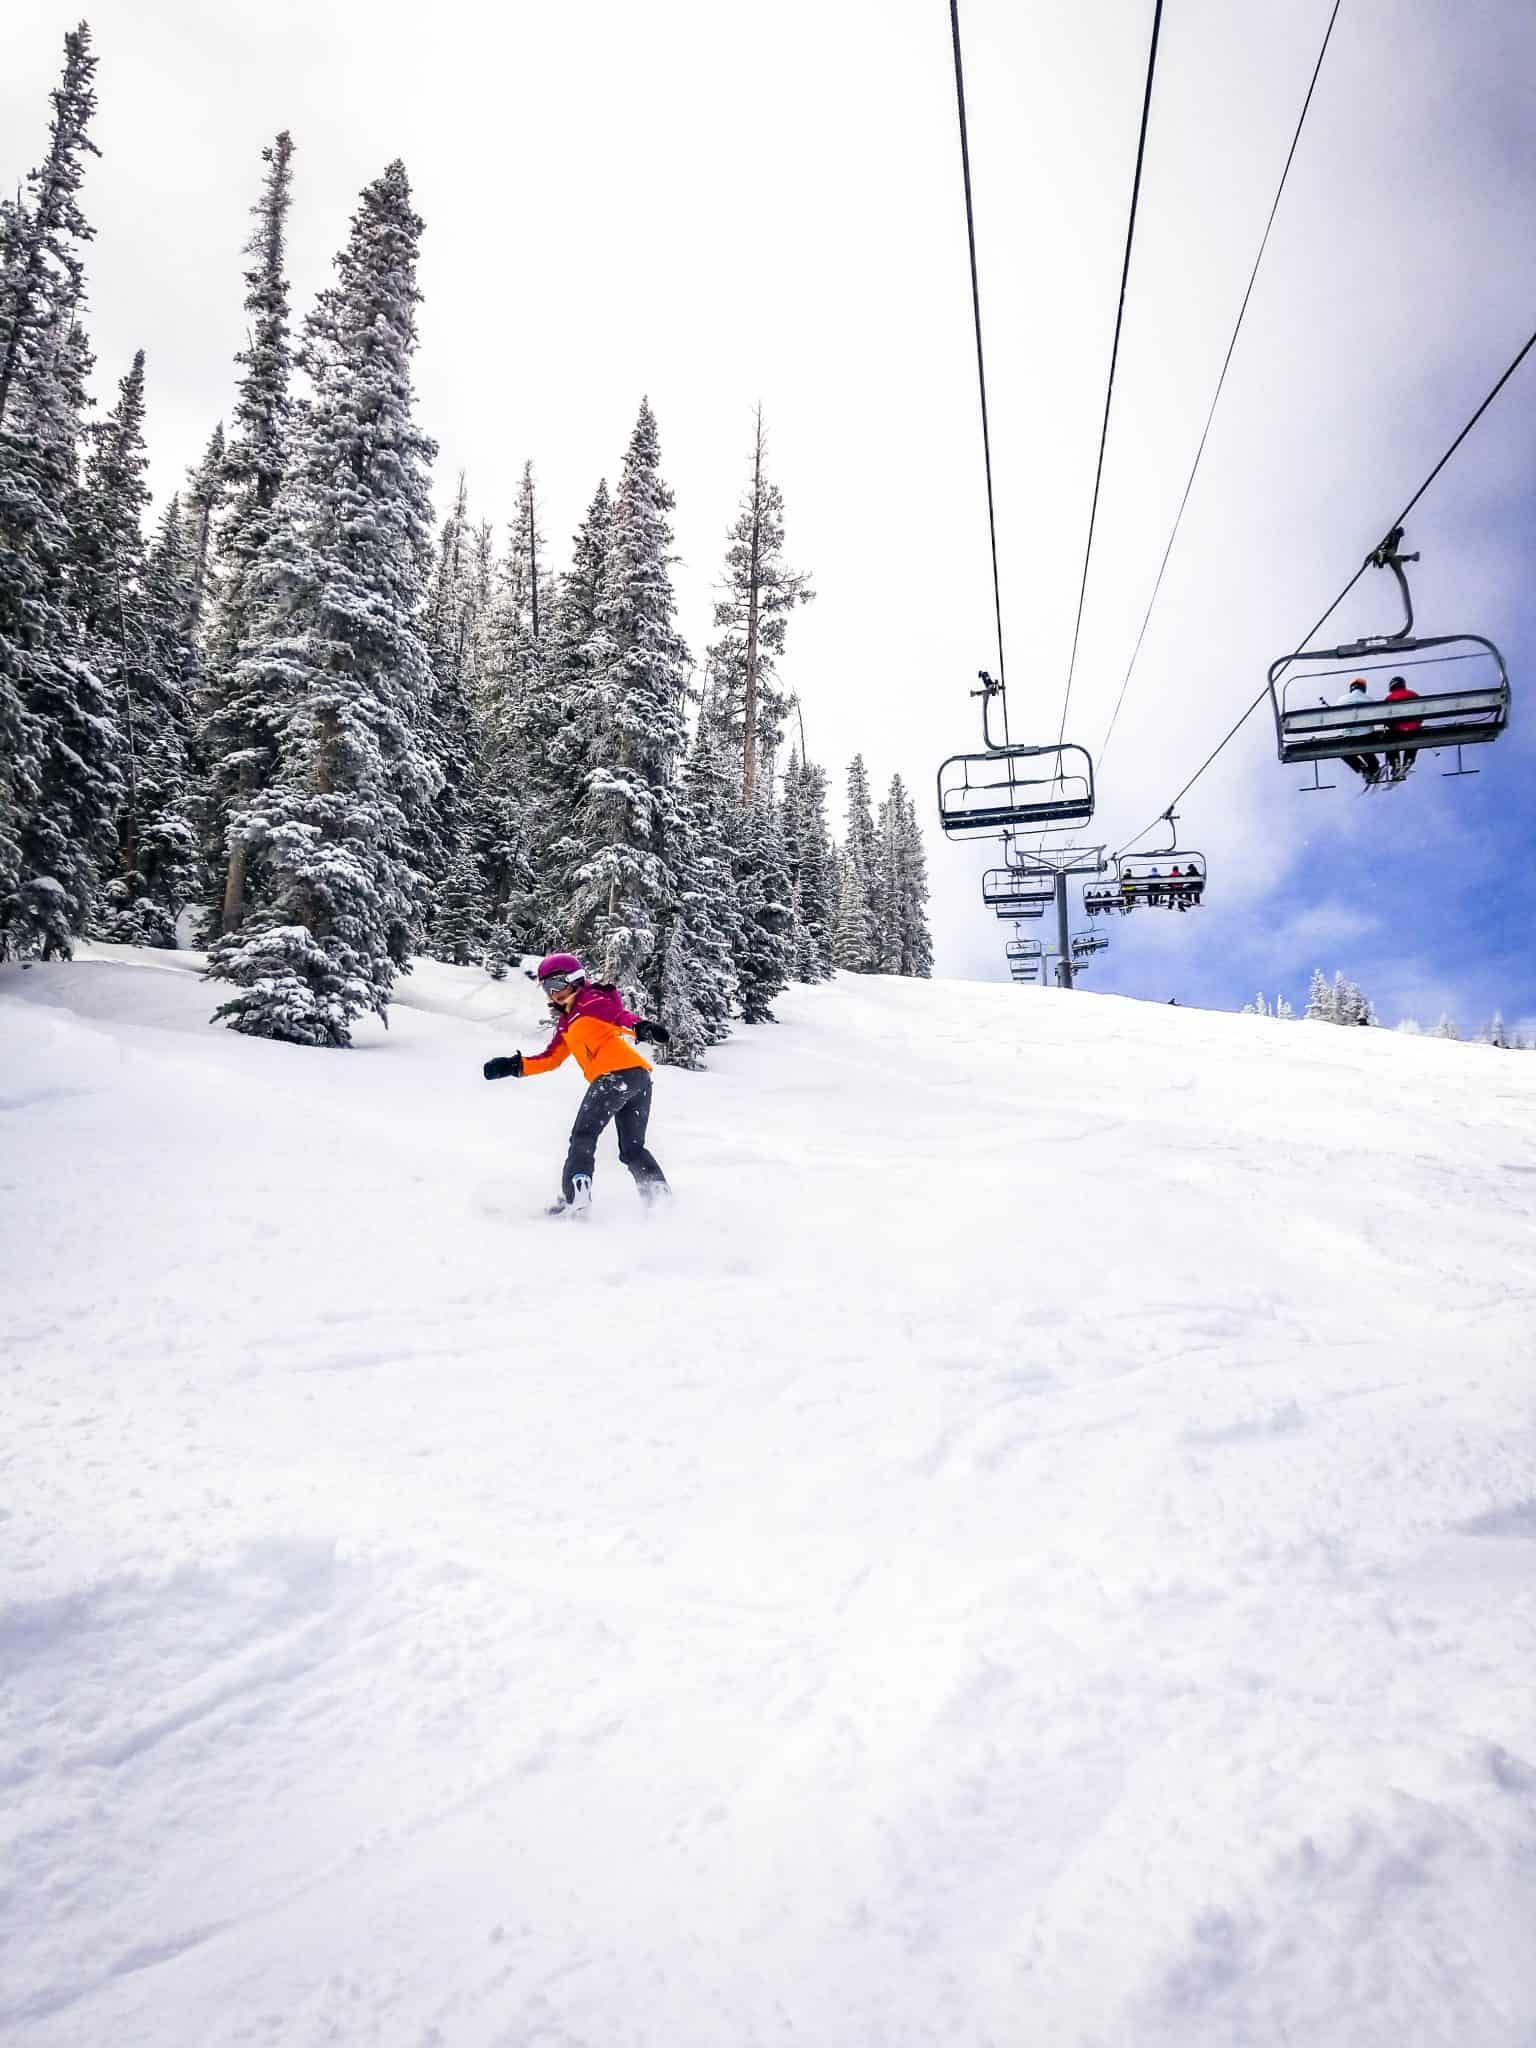 Colorado Ski Resorts - Aspen Snowmass